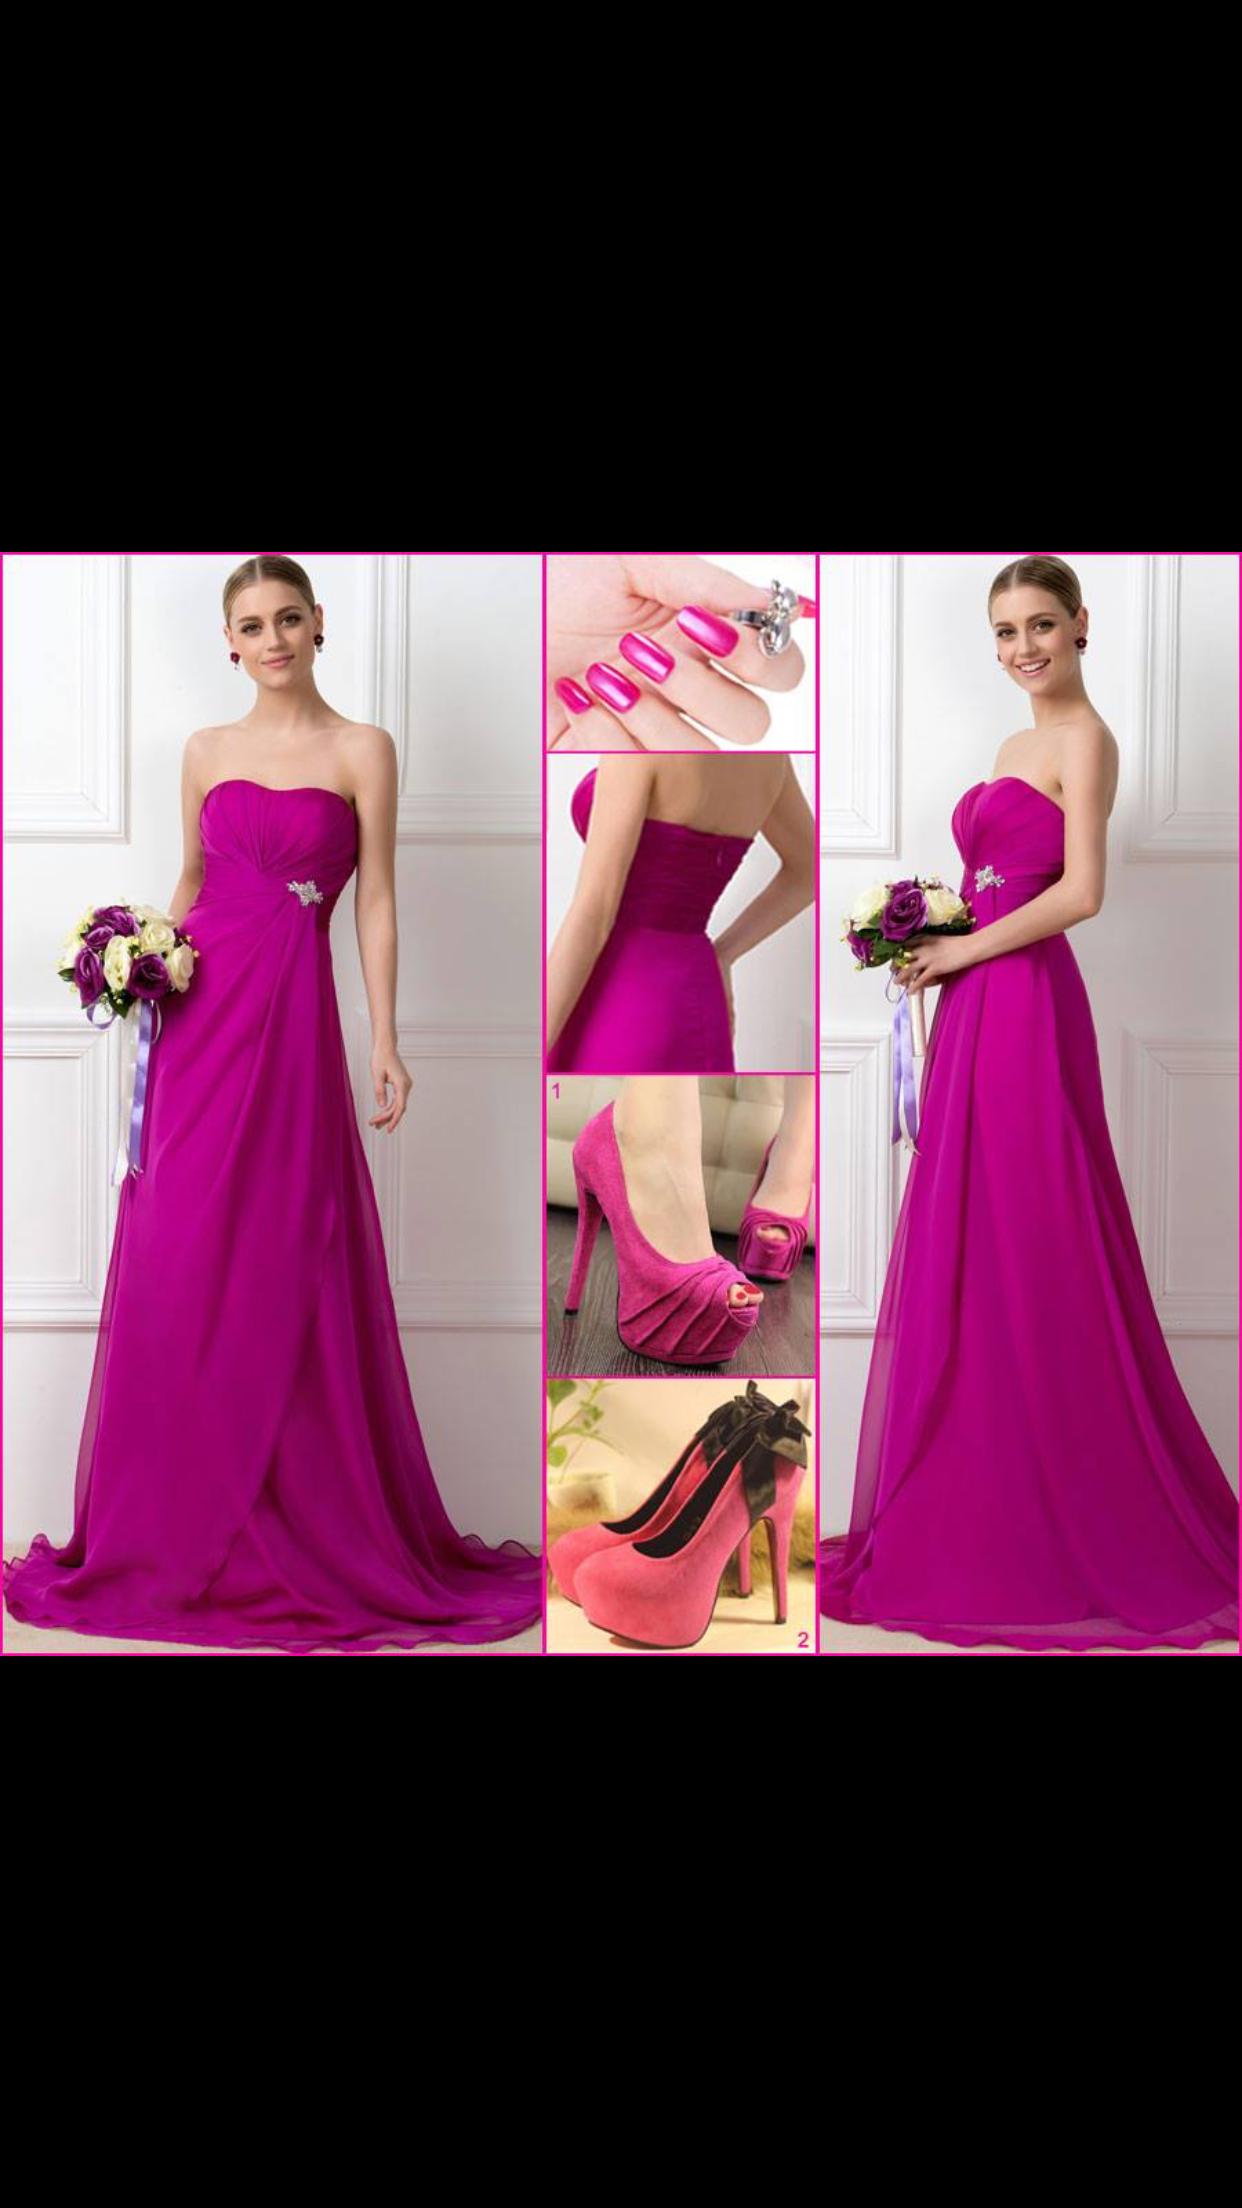 Pin de Vidette Barber en I want that dress!!! | Pinterest